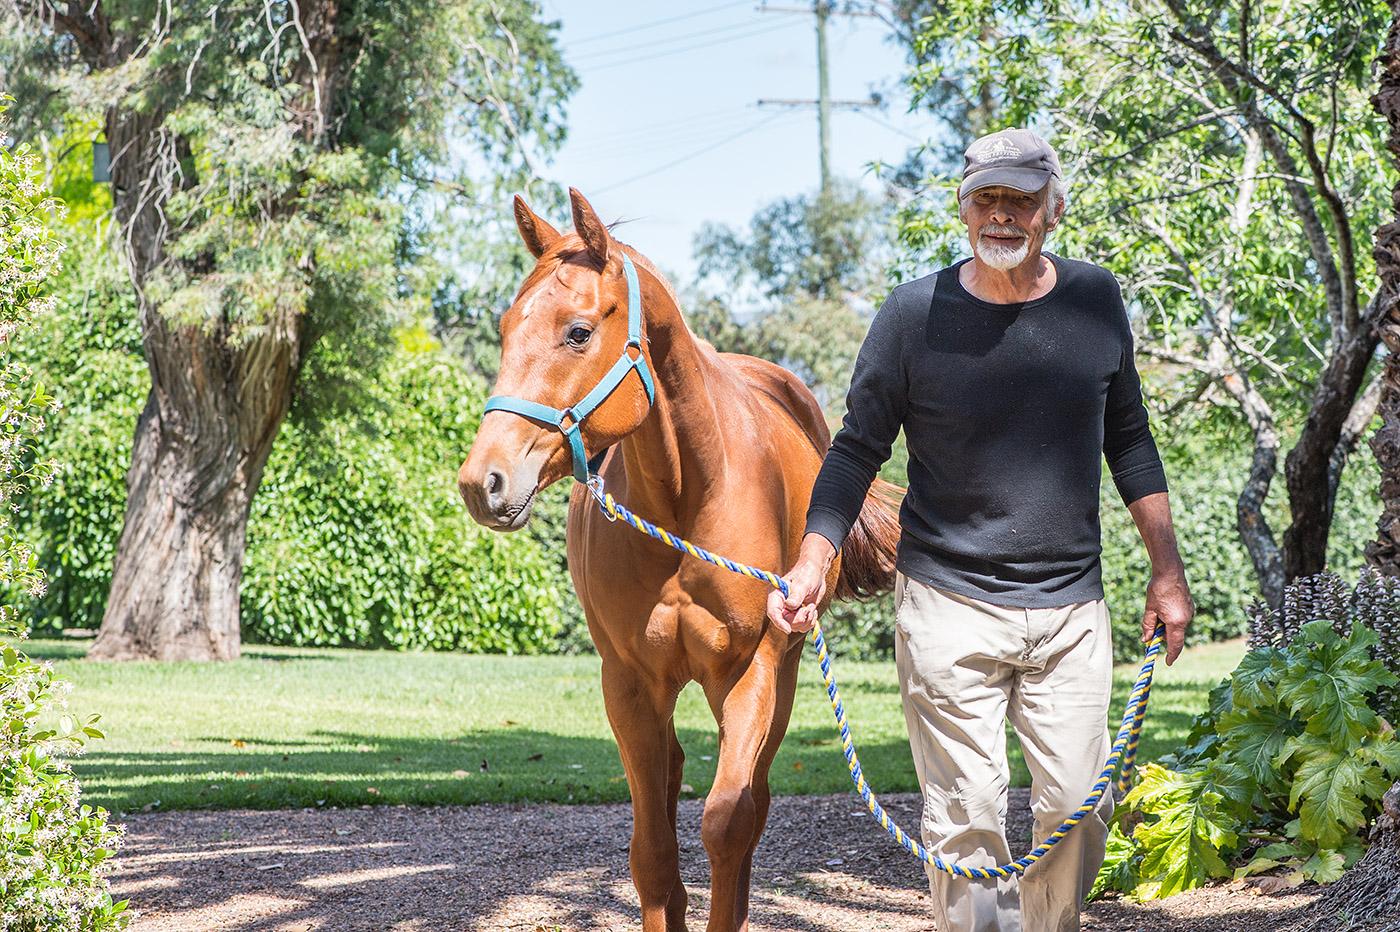 man leads horse